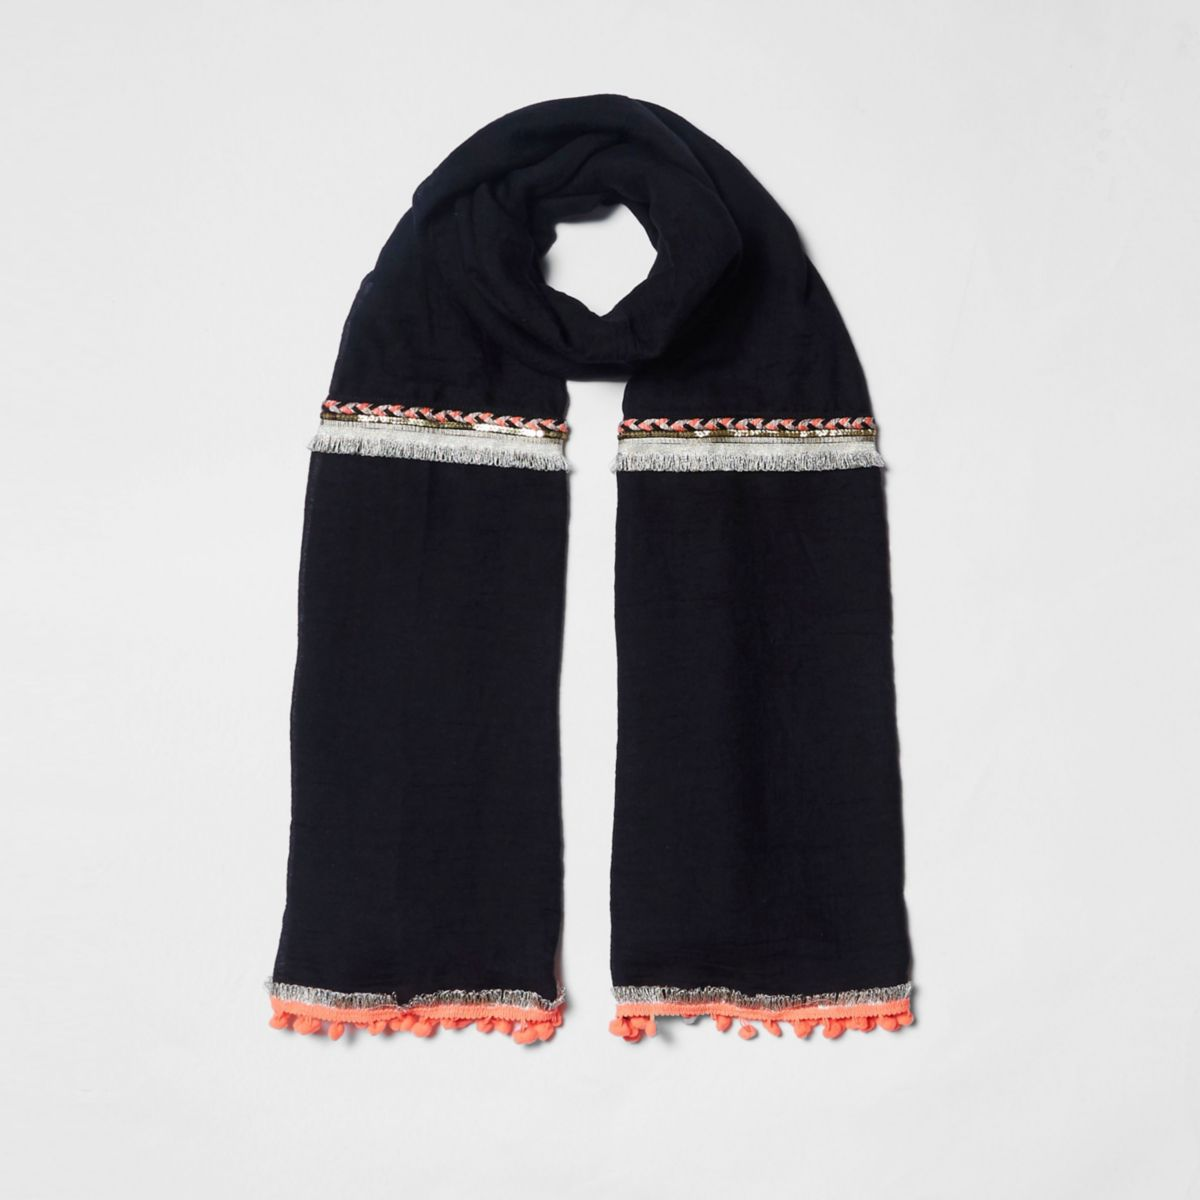 Black neon embellished trim long scarf